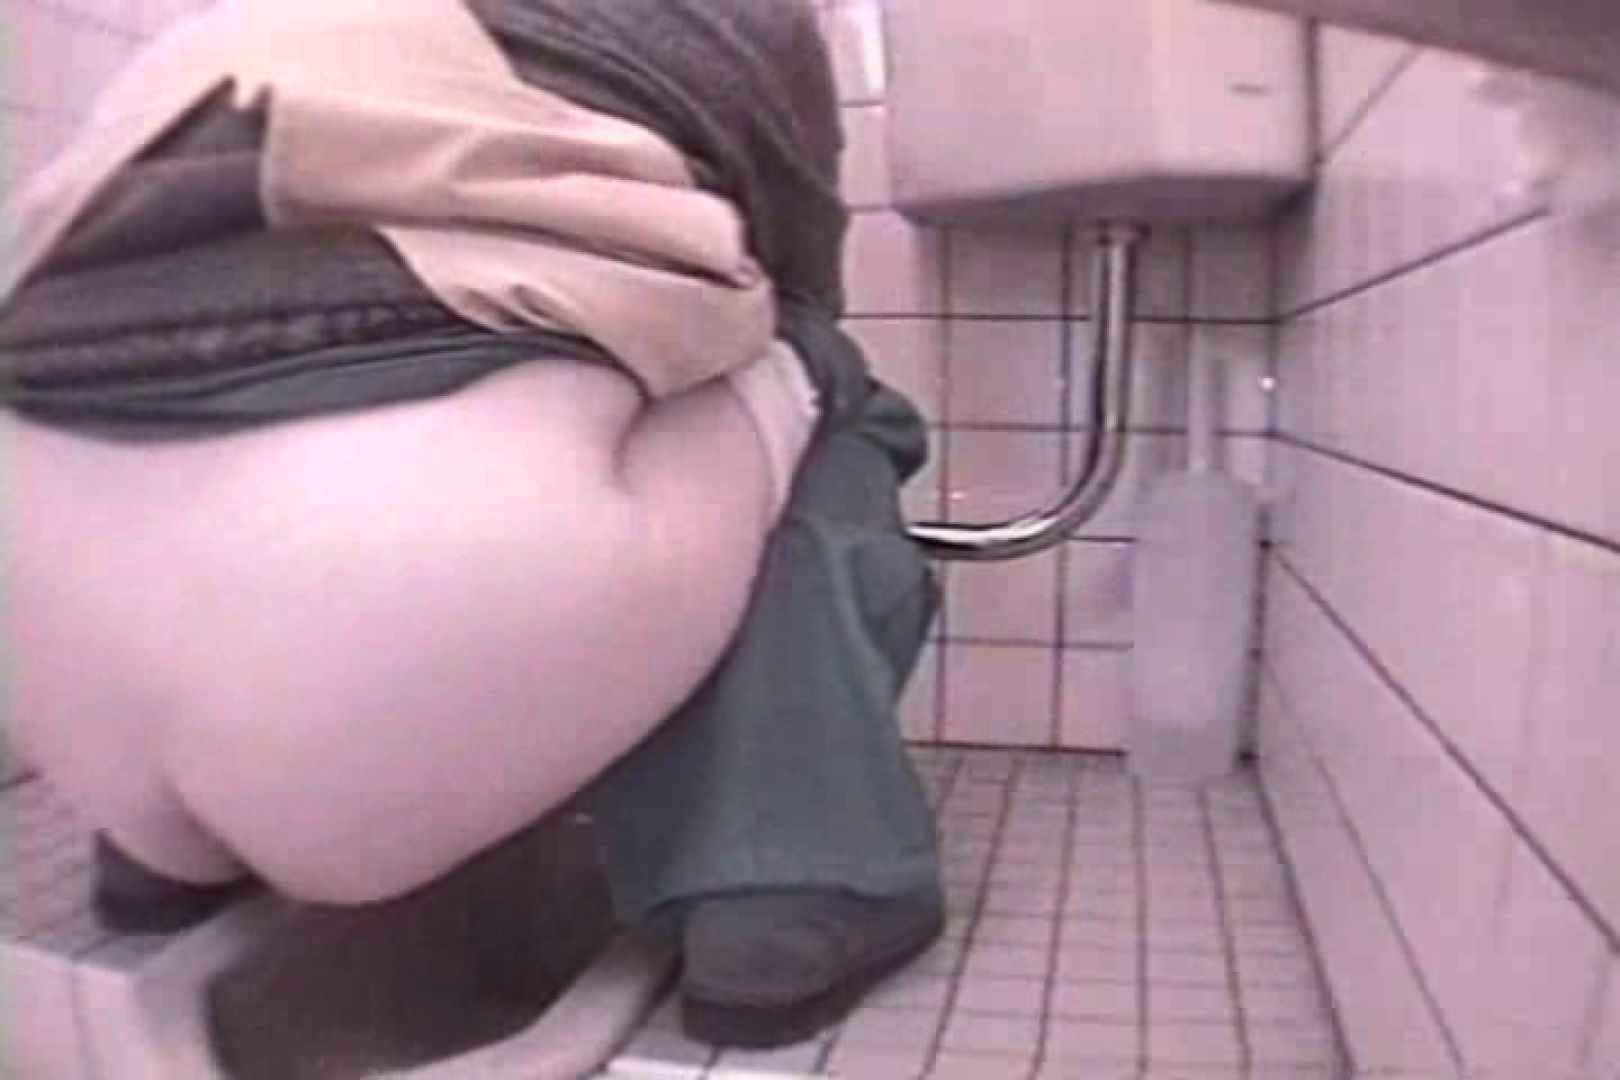 STY-016 女子大生●盗撮 お便所百選・百態の職人芸 女子大生特集  95連発 33